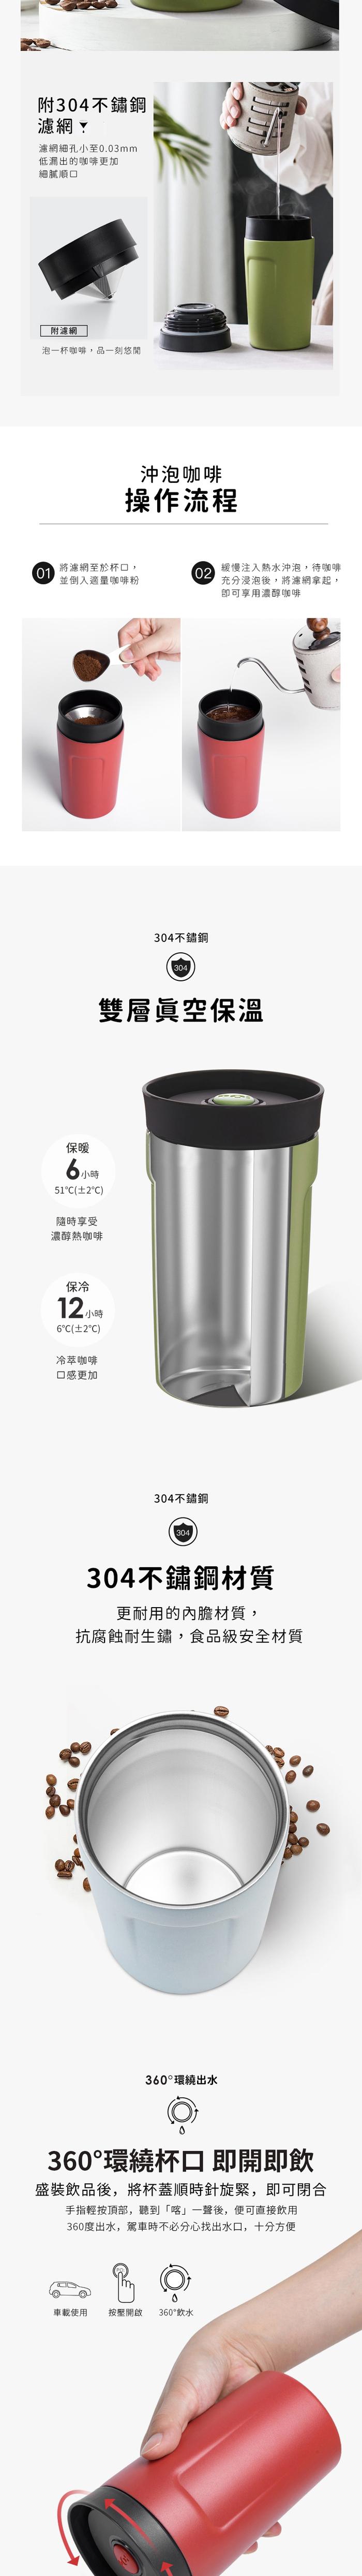 PO:Selected 丹麥手沖咖啡禮盒組(手沖咖啡壺-灰/隨行保溫咖啡杯350ml-紅)